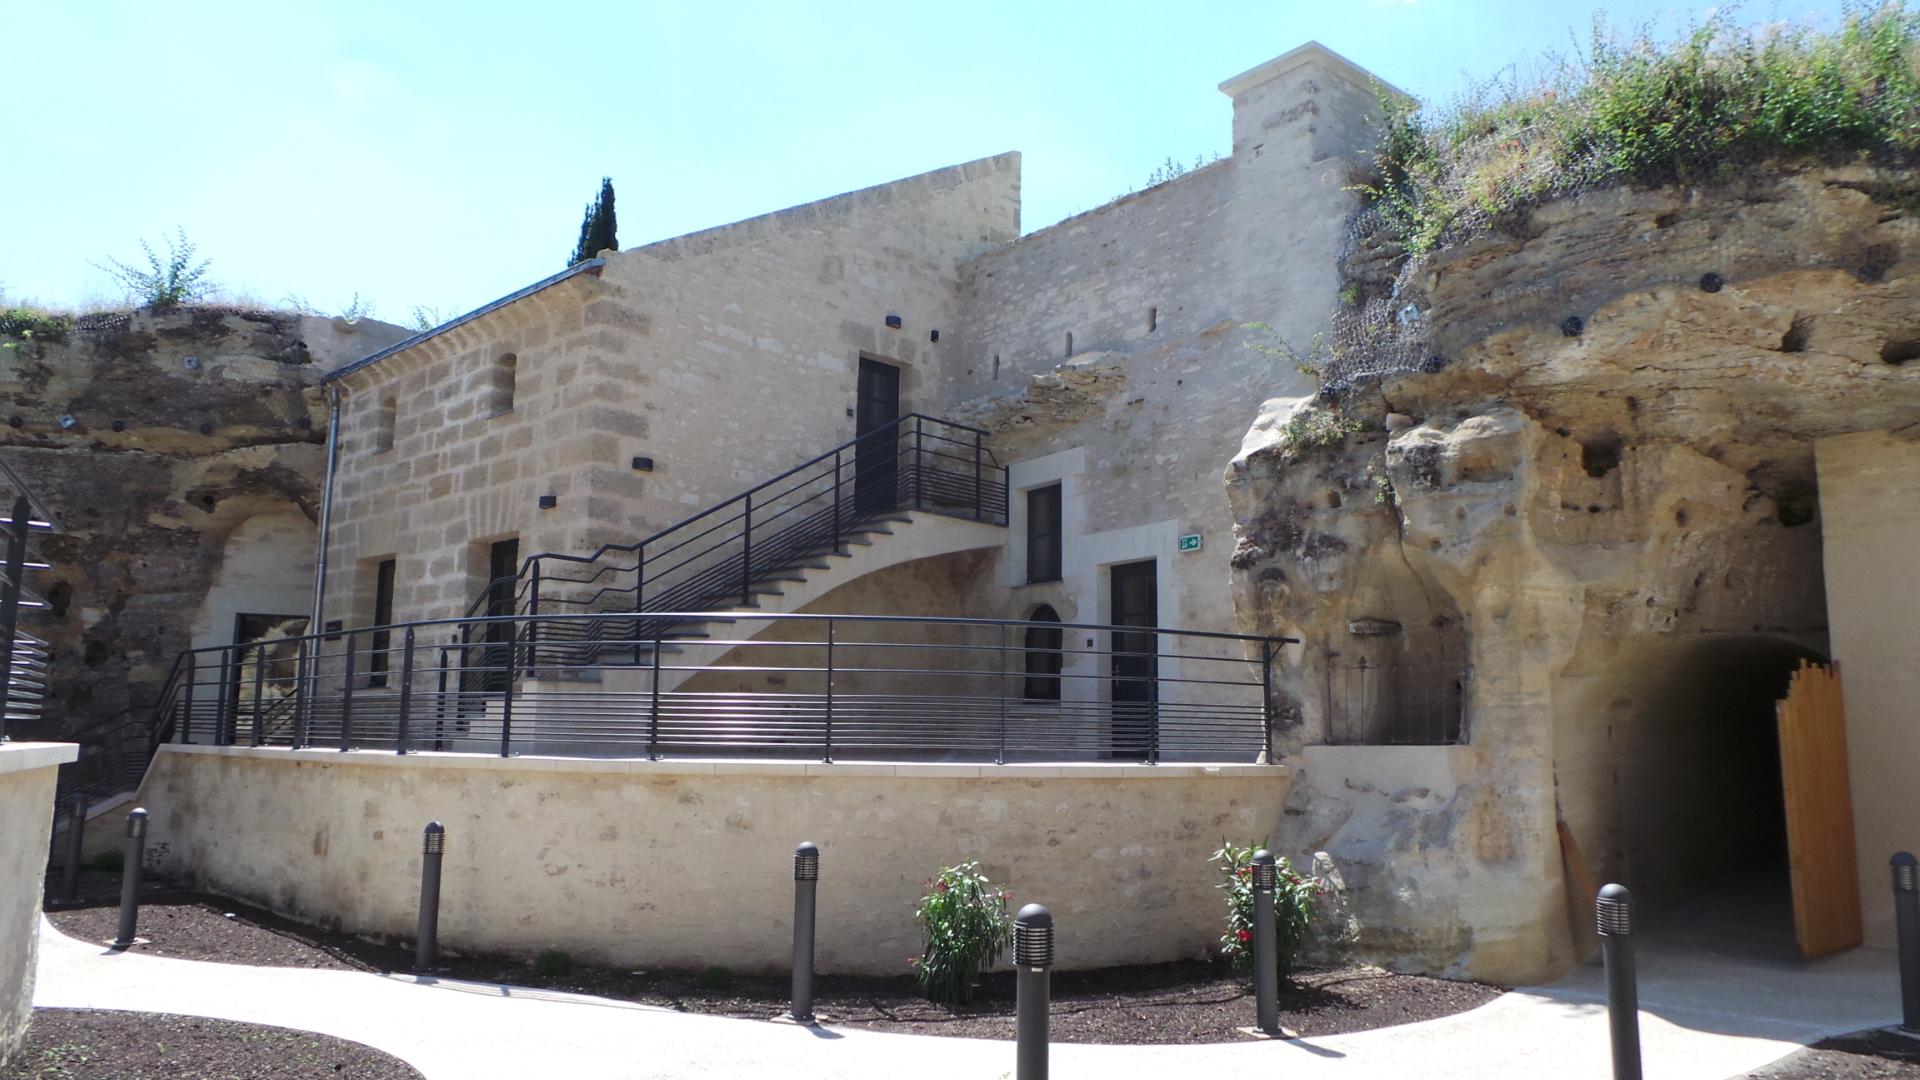 benaiteau construction hôtel rocaminori